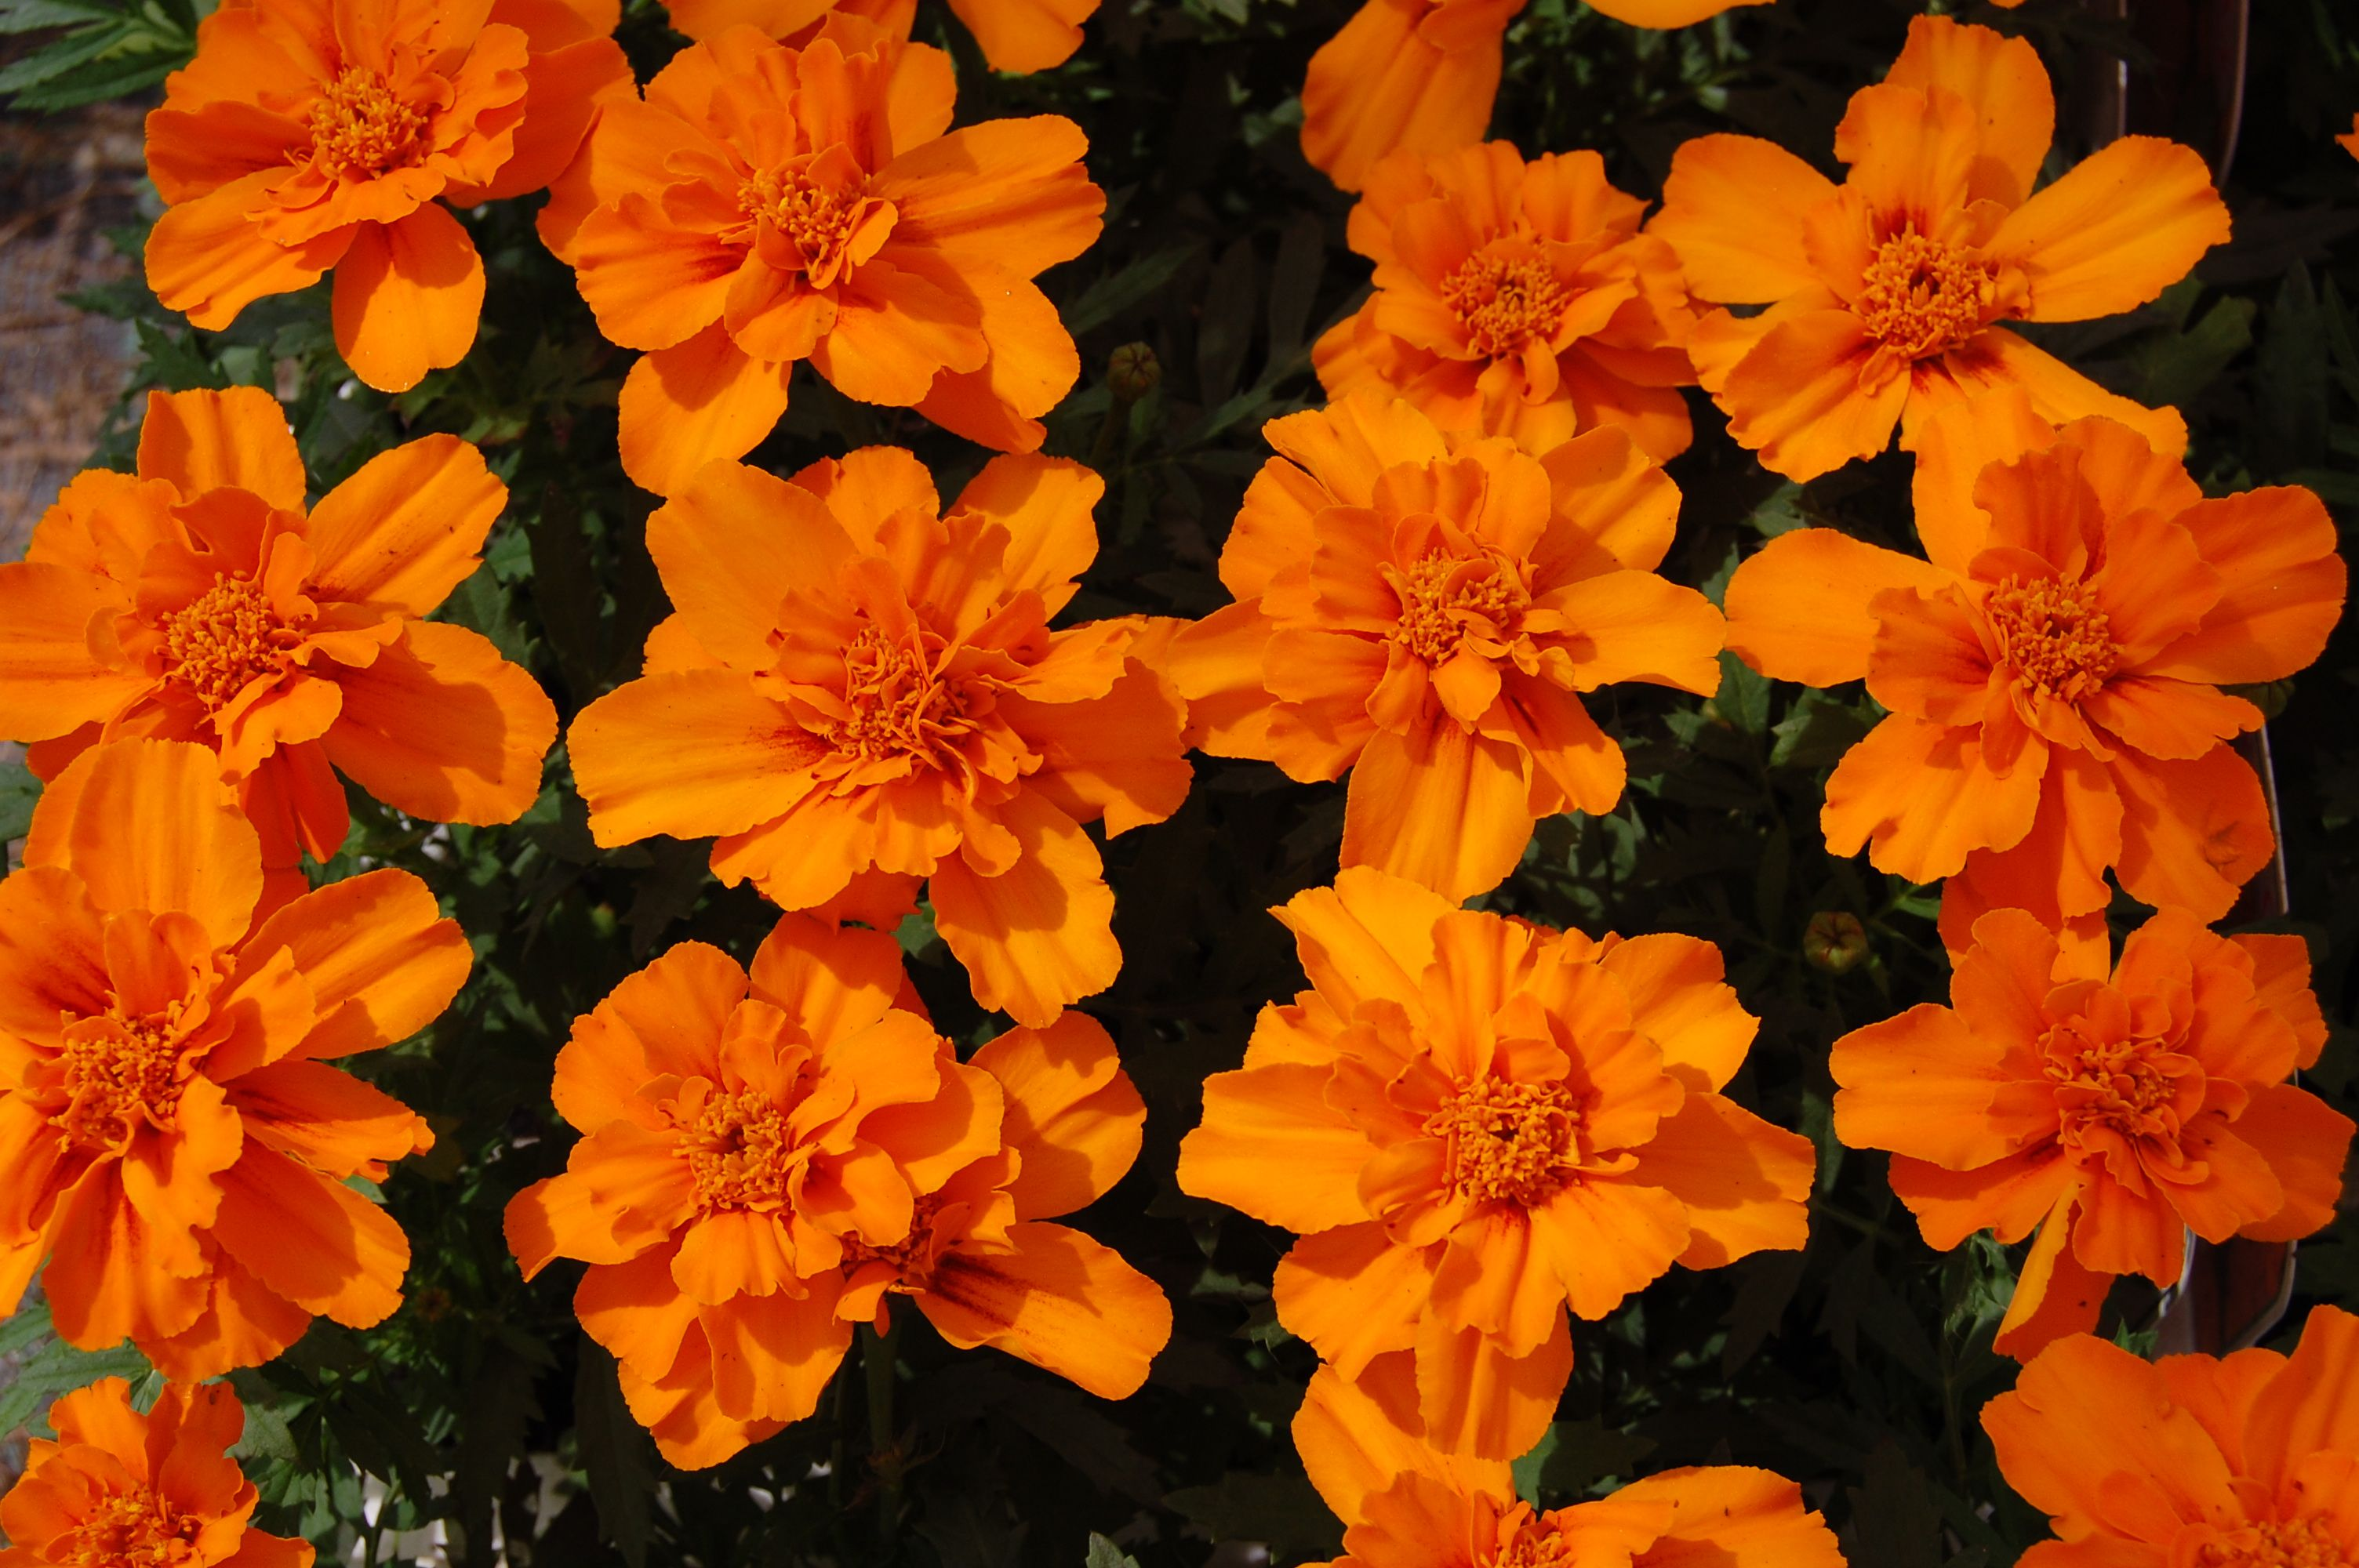 Marigold tangerine